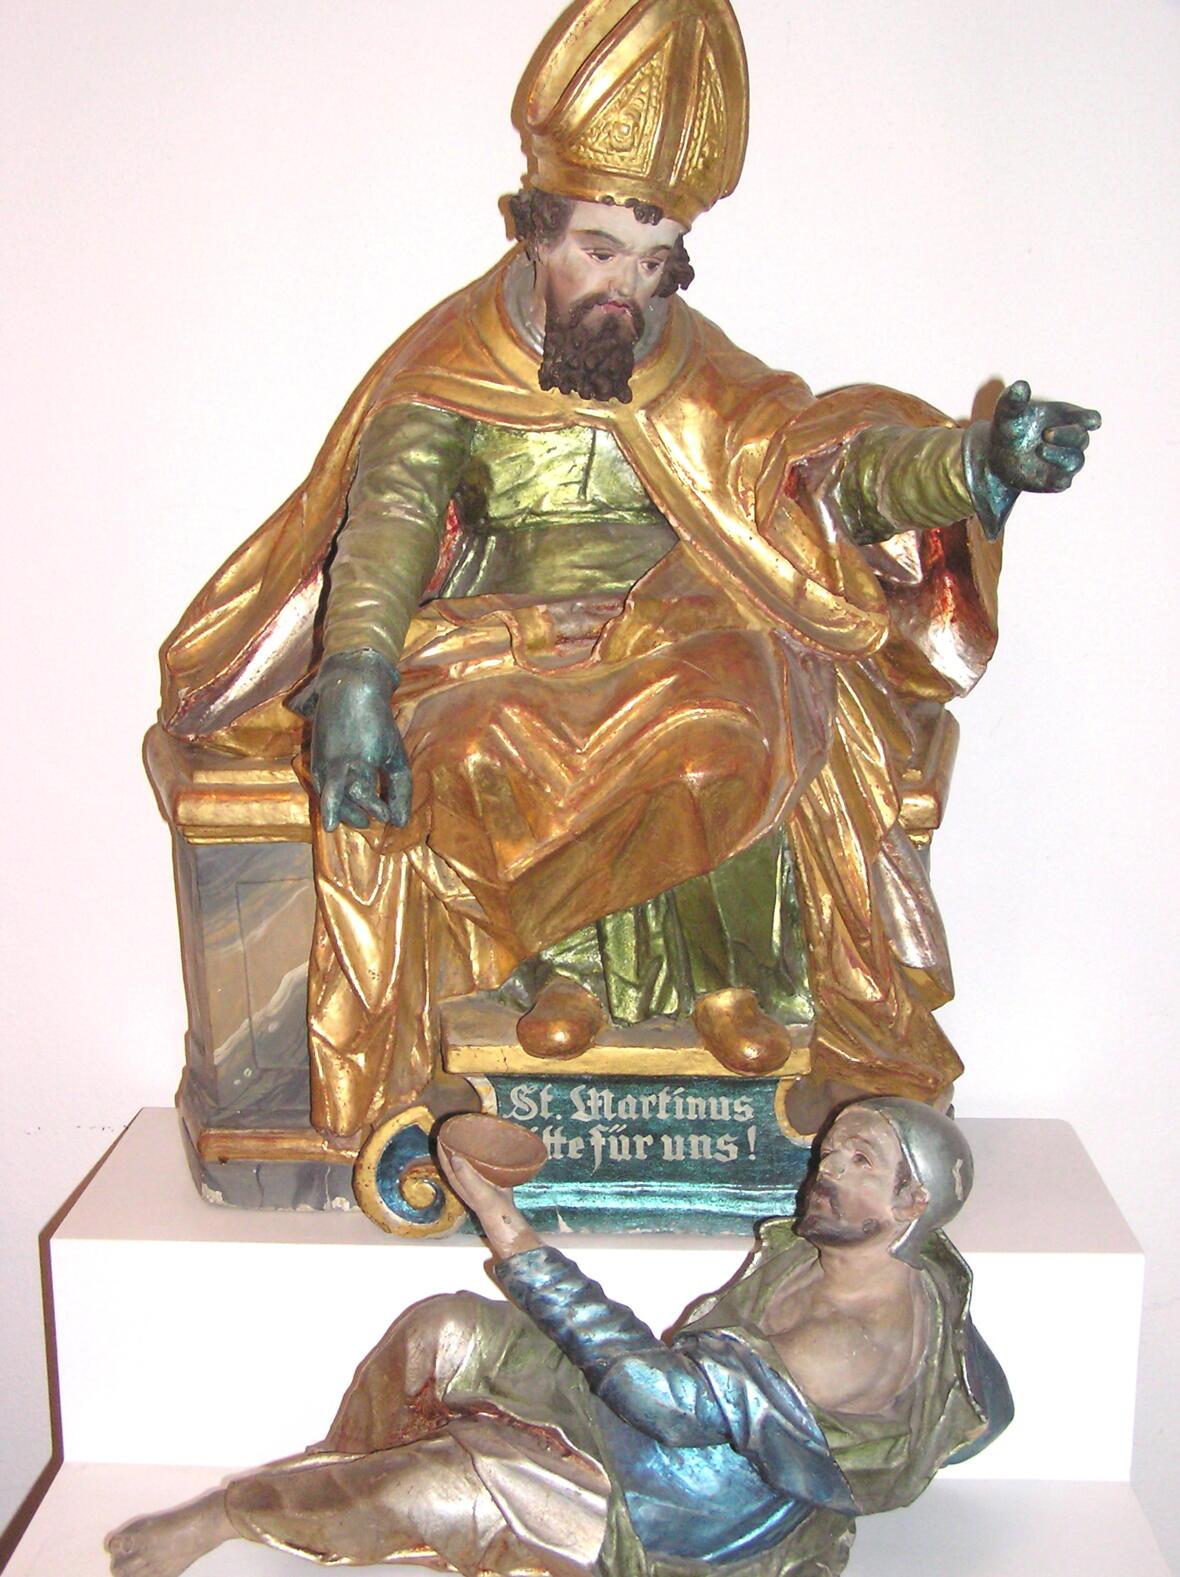 St. Martin jpg